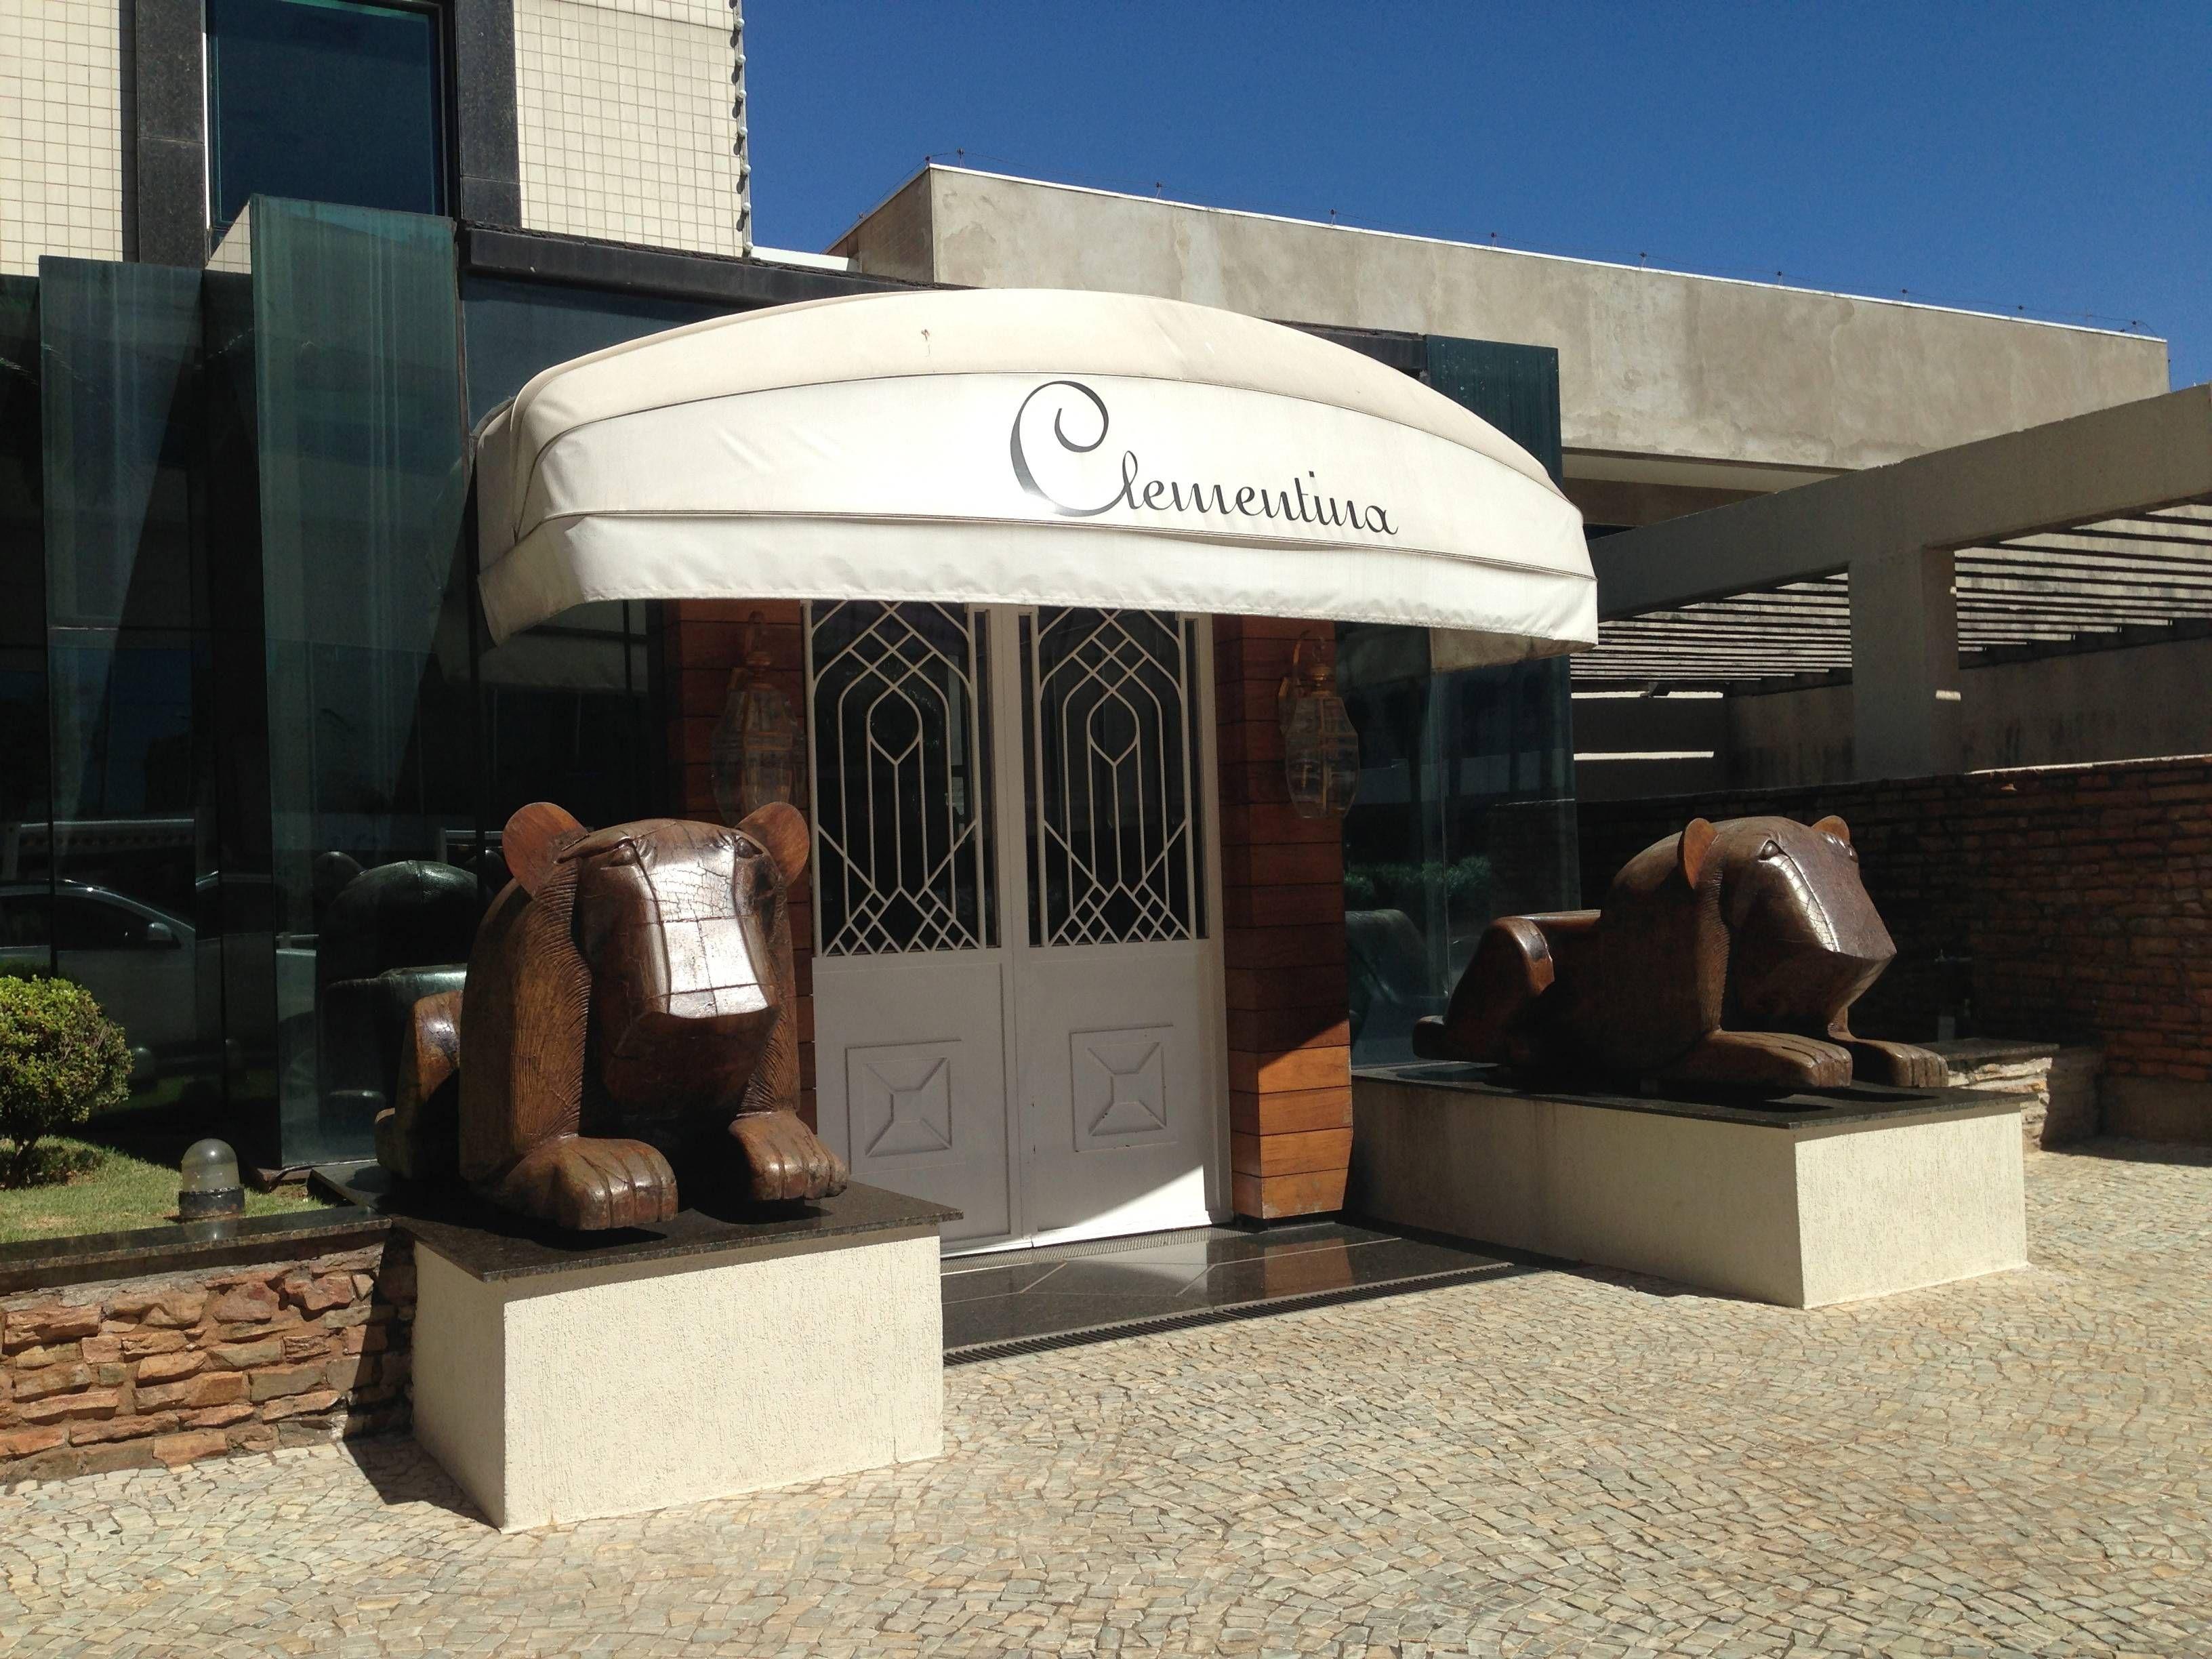 Plaza Shopping Hotel Uberlandia